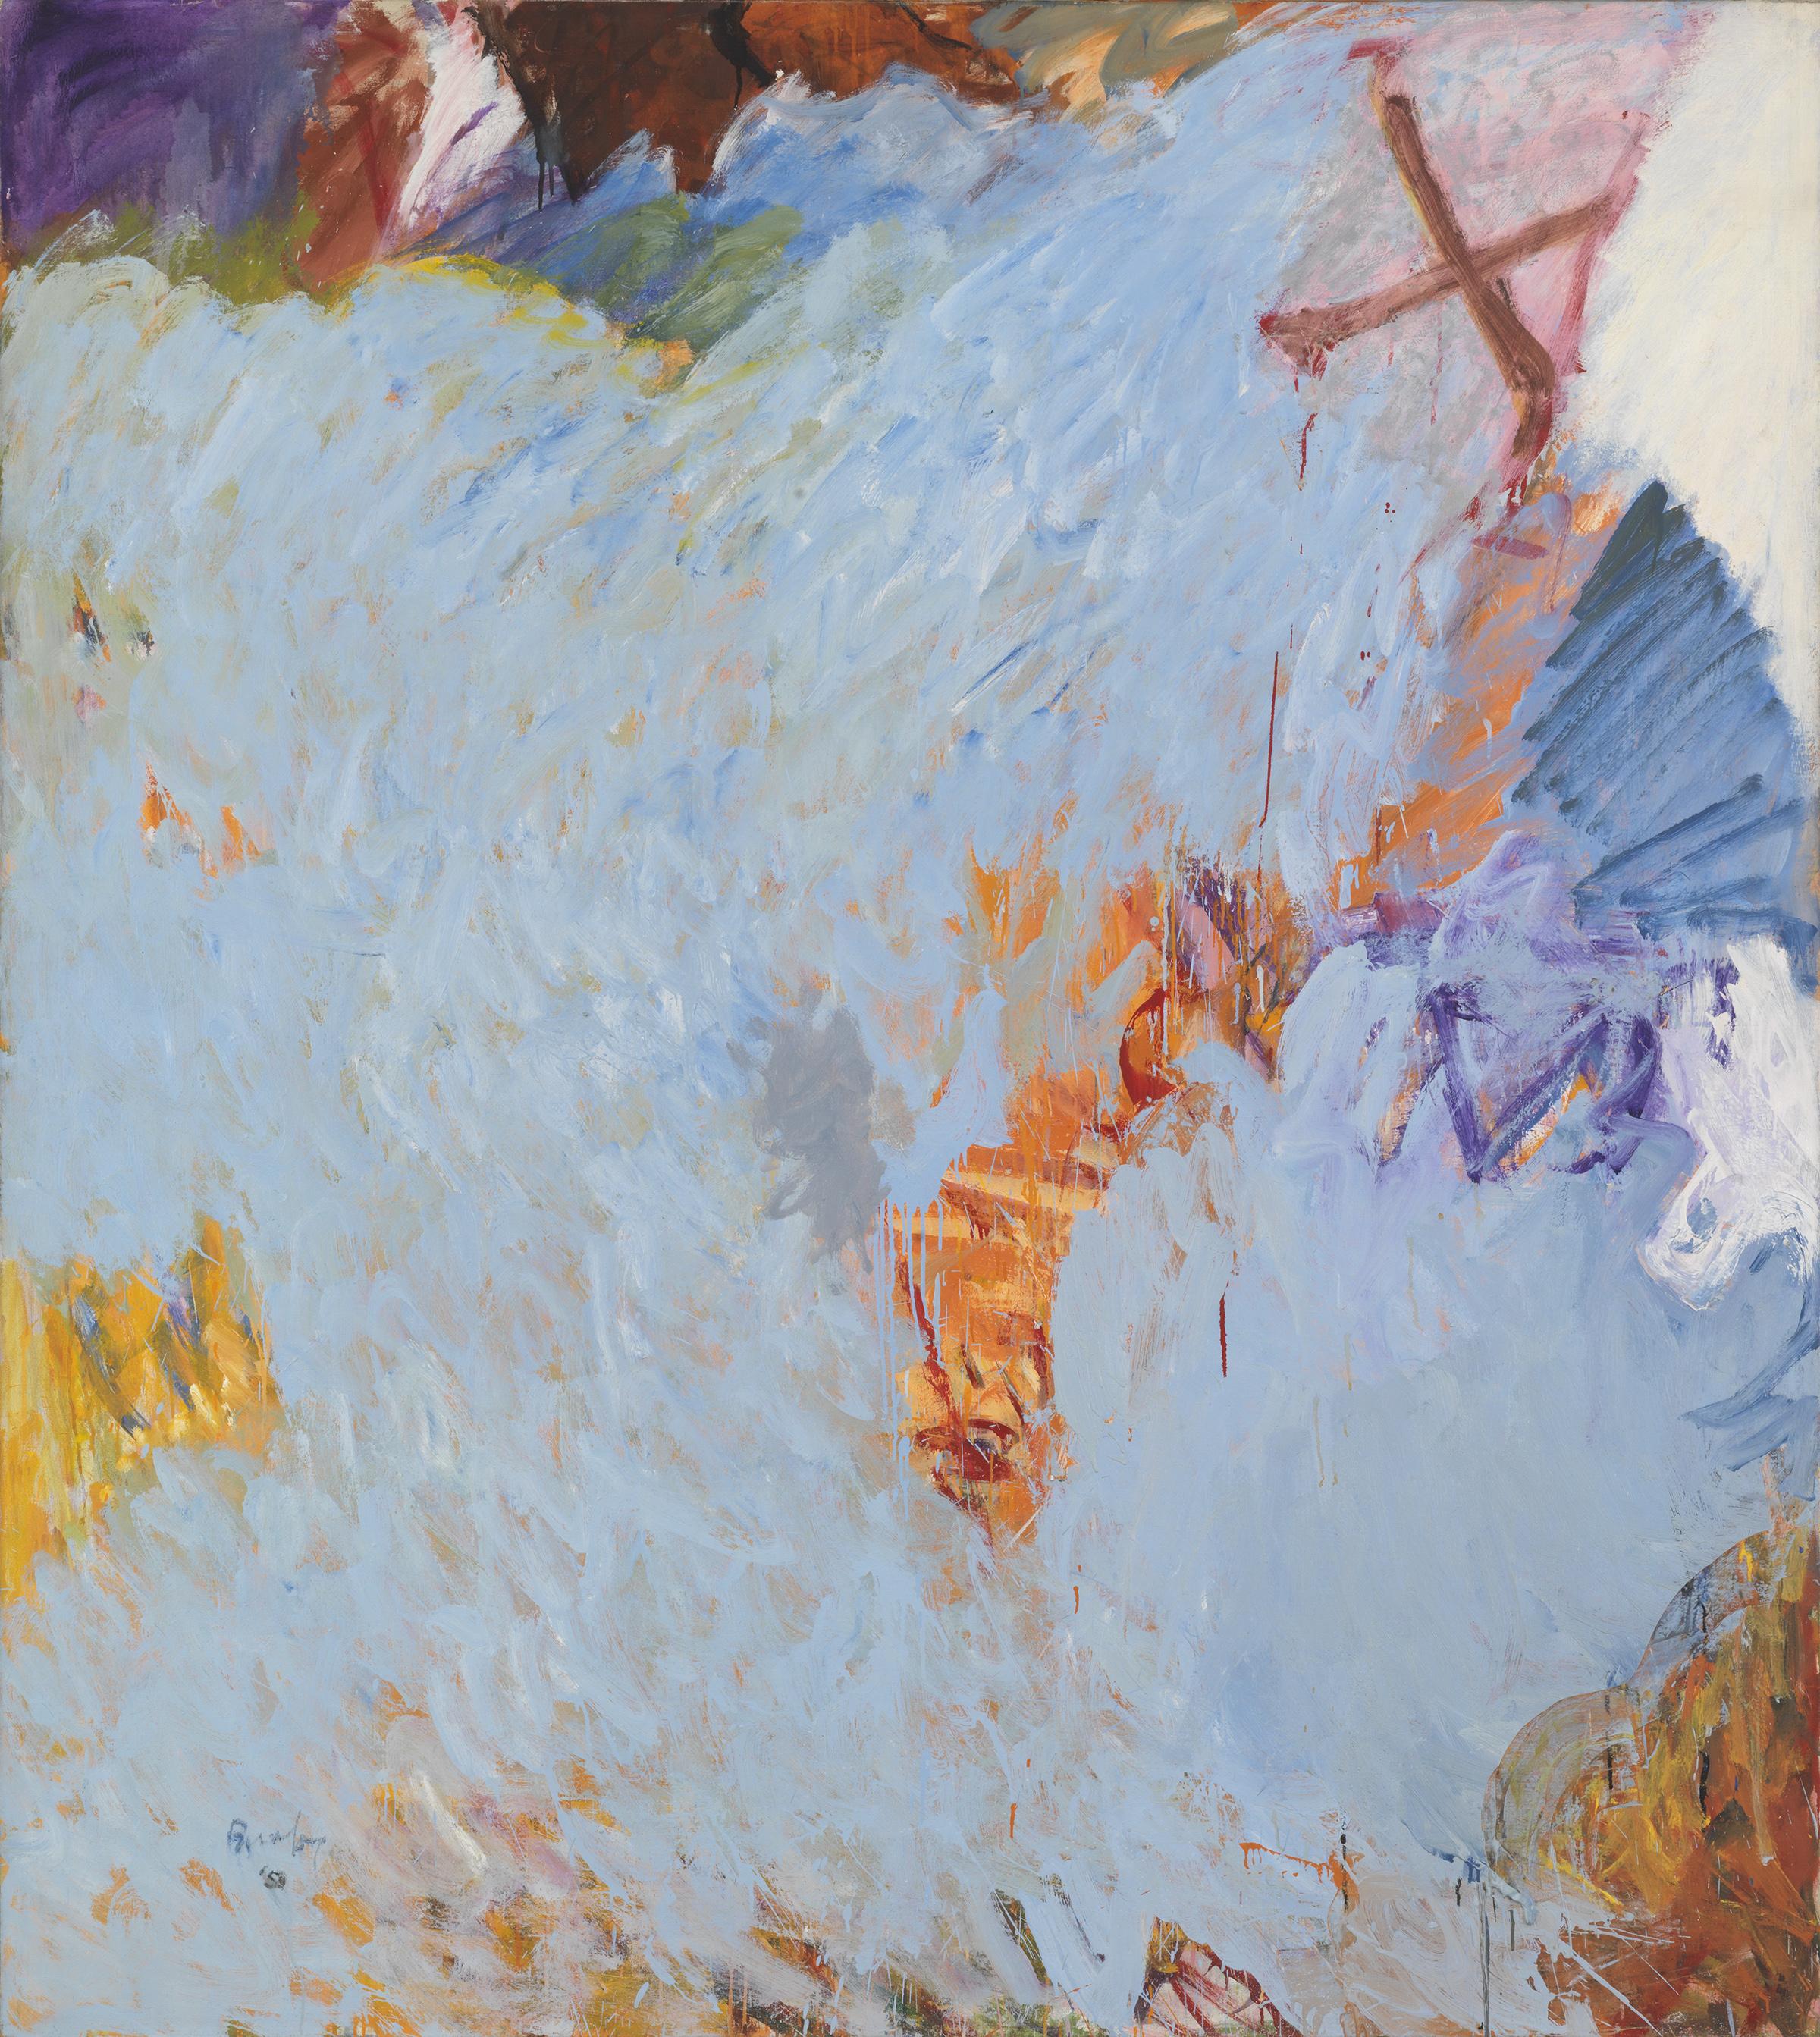 Pat Passlof  Stove , 1959 Oil on linen 77x 69 inches